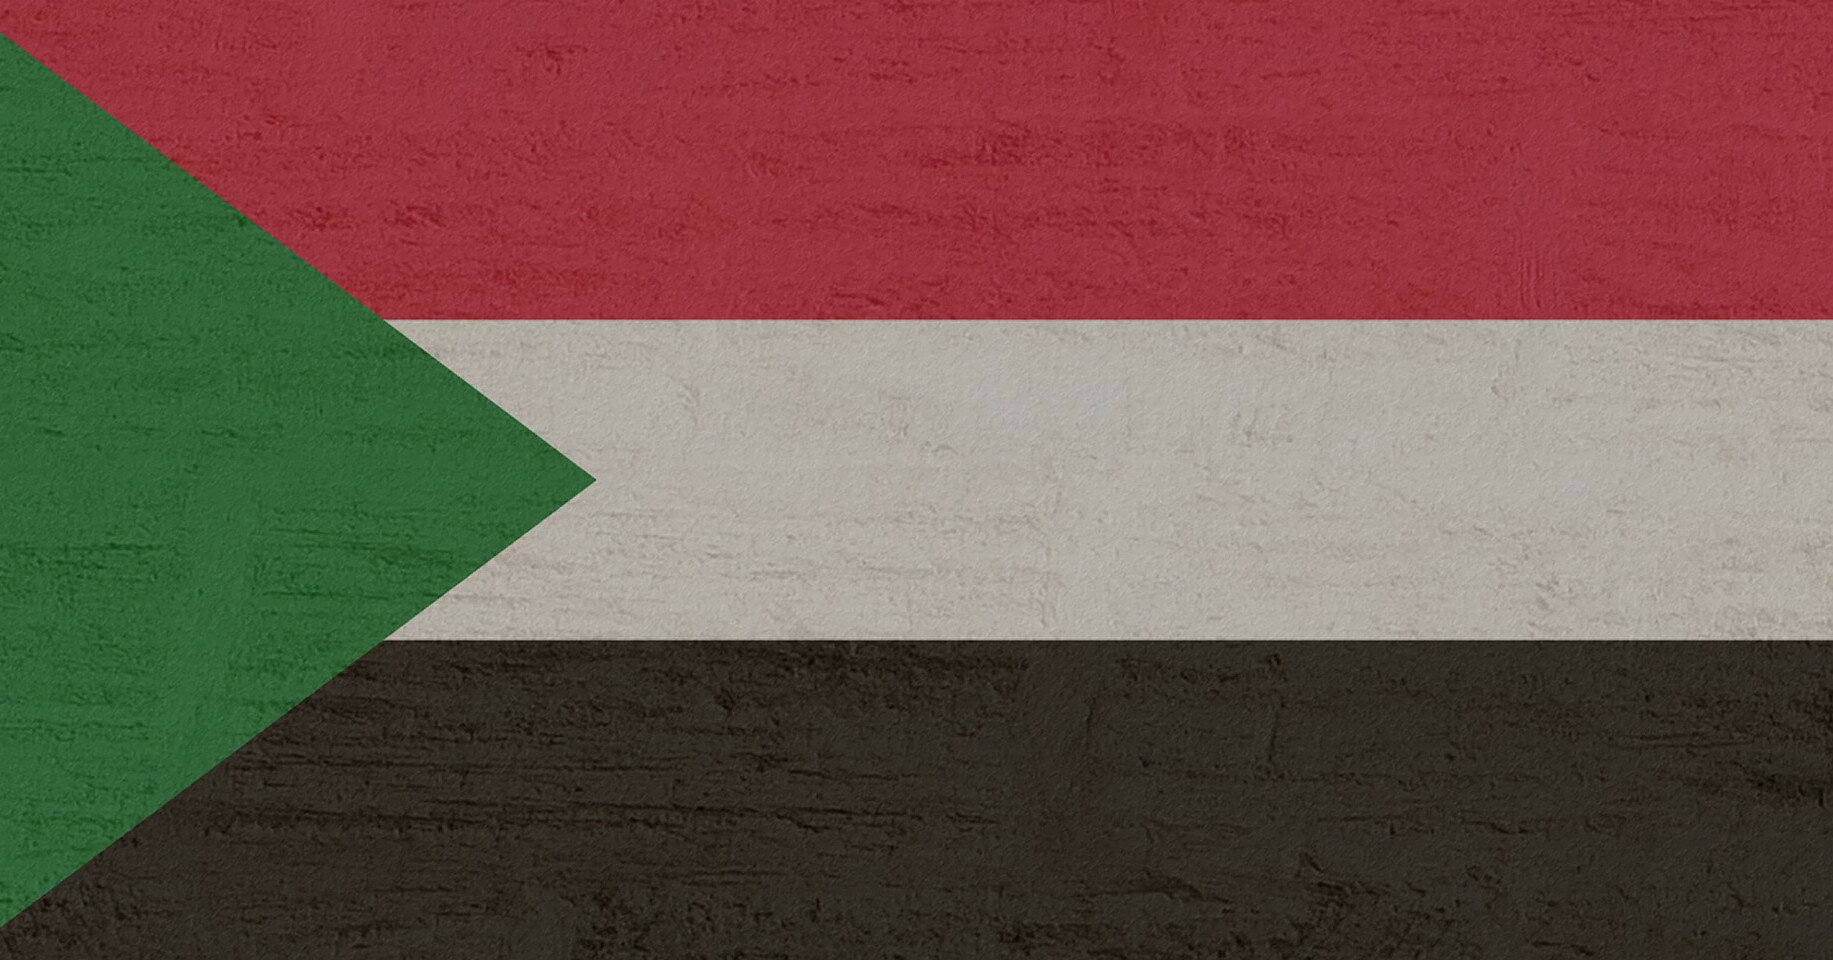 Судан решил пересмотреть договор о базе РФ на Красном море